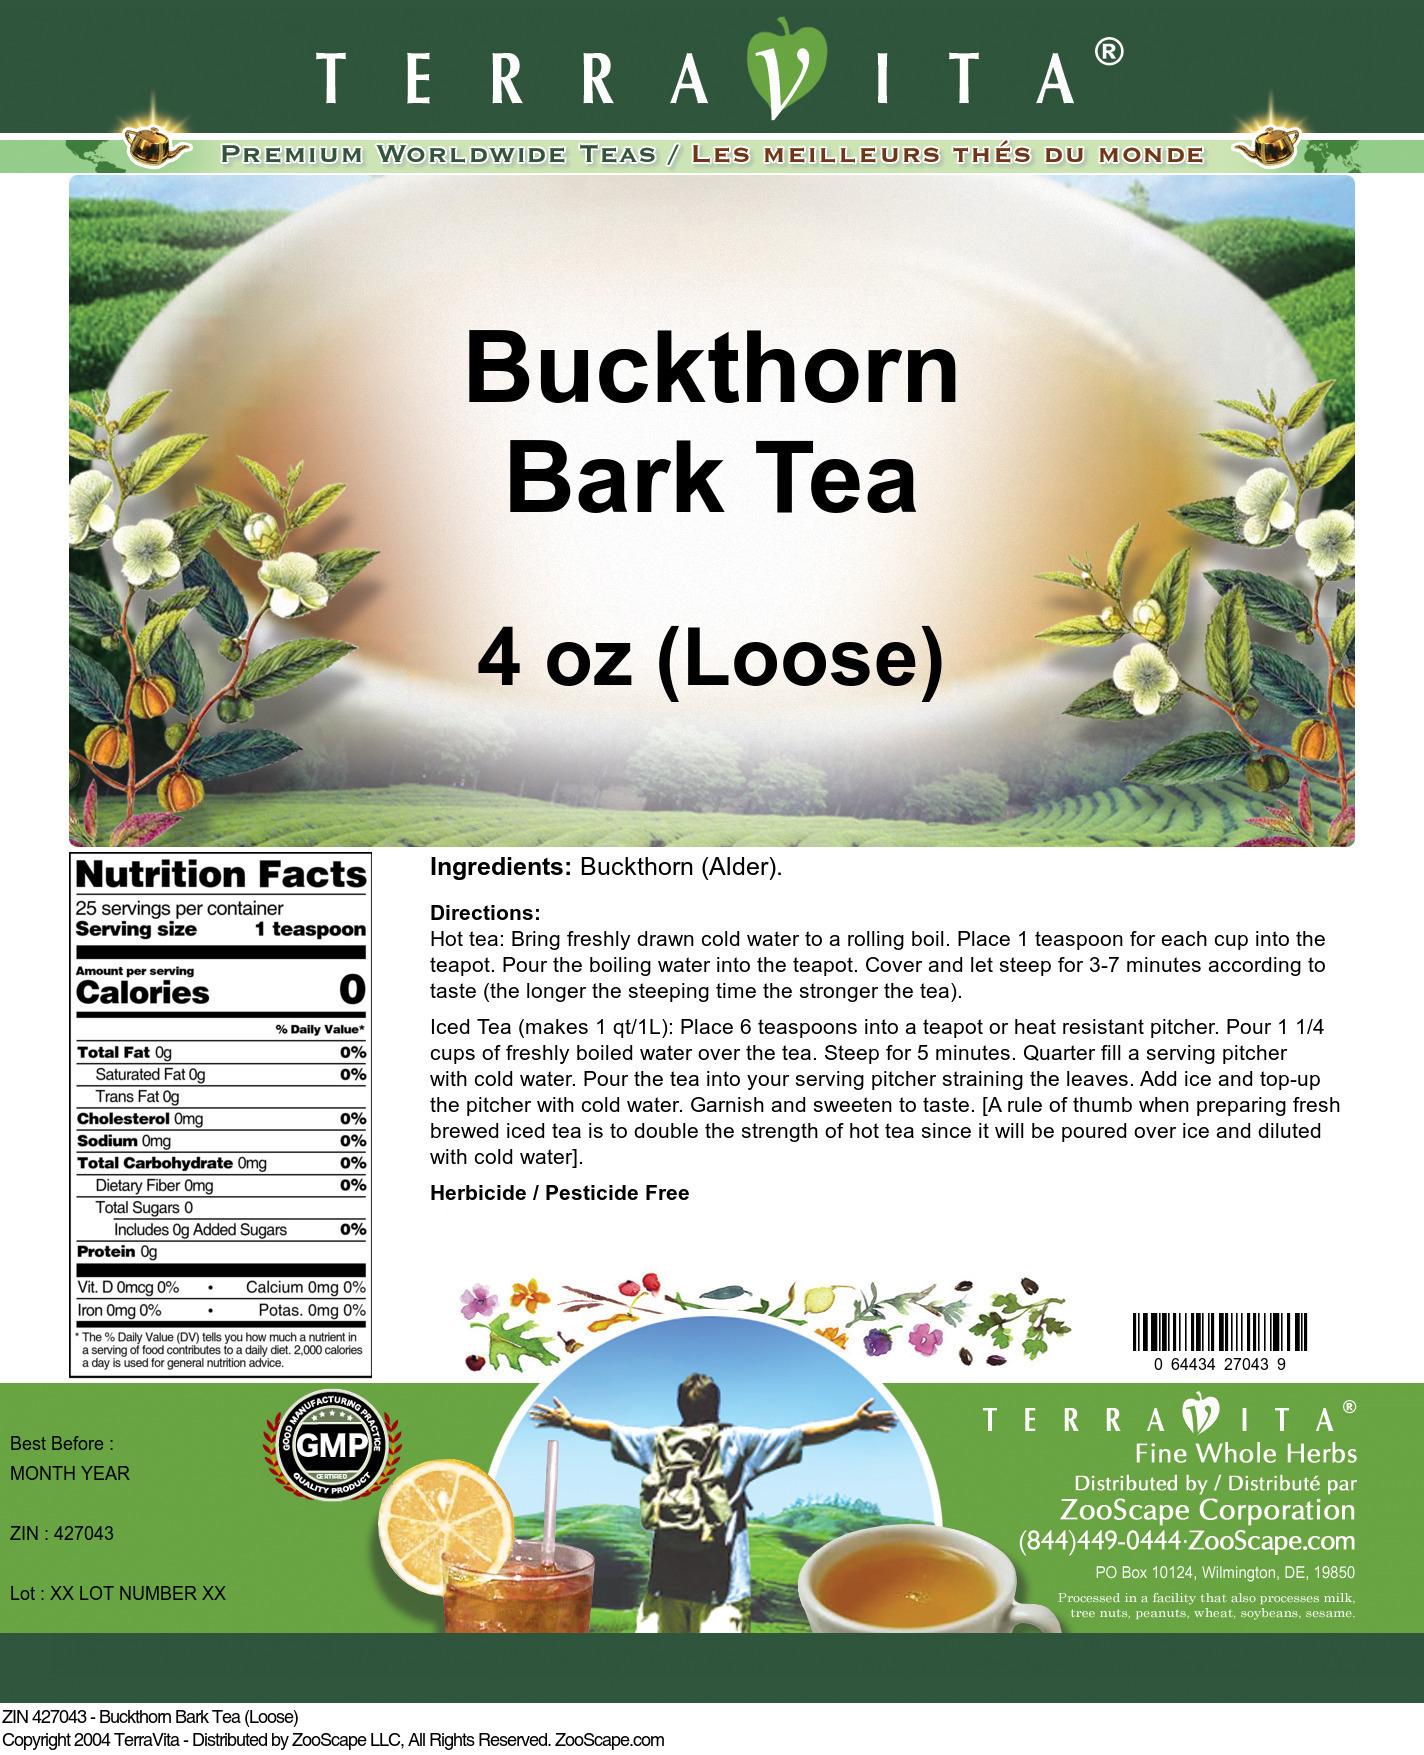 Buckthorn Bark Tea (Loose)